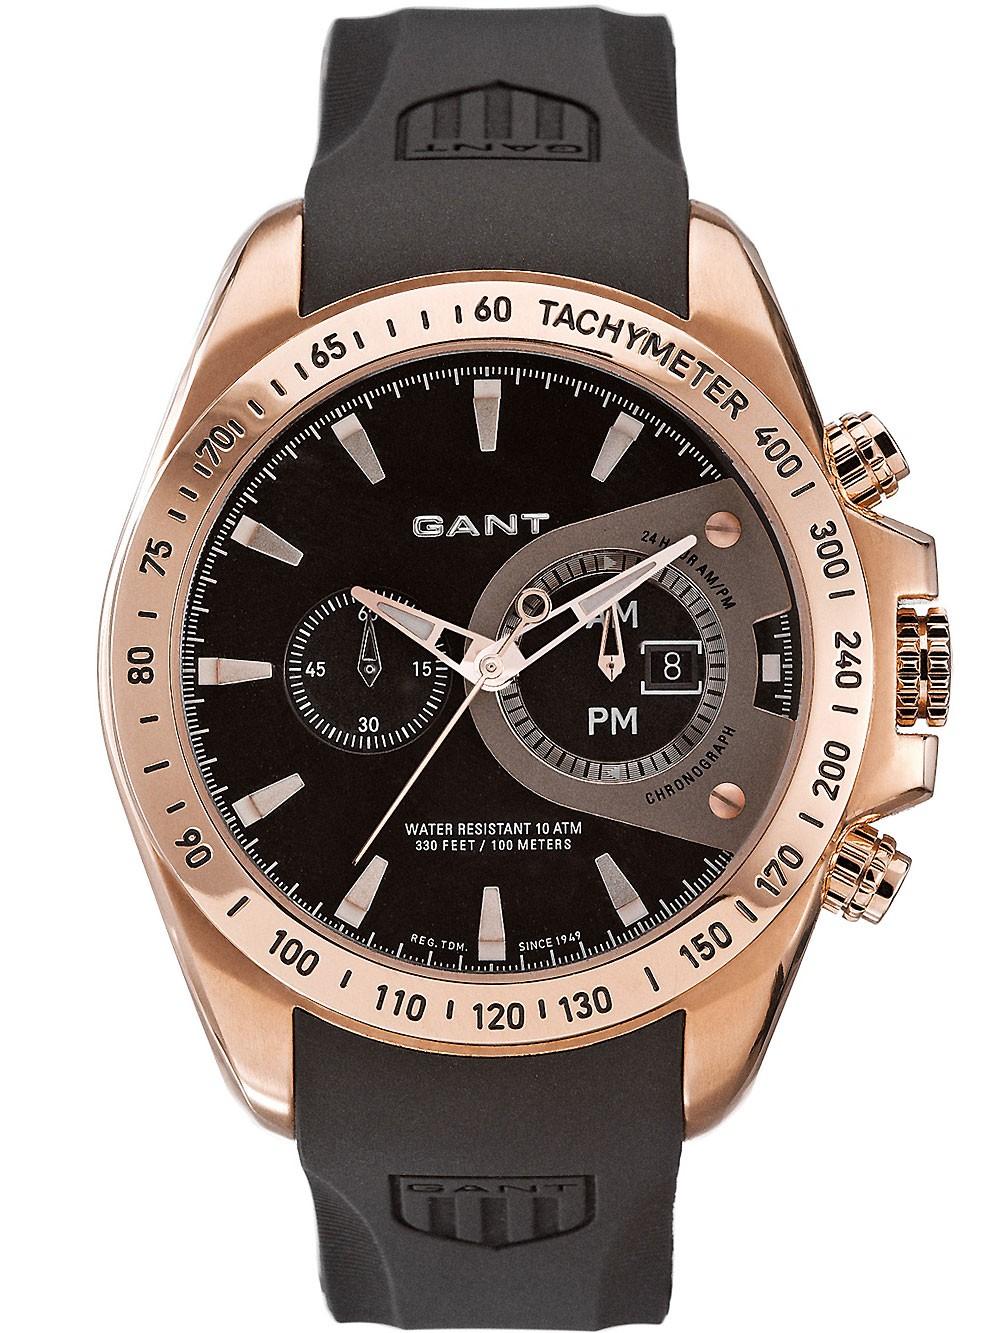 Gant W10385 Bedford Herren 46mm 10ATM